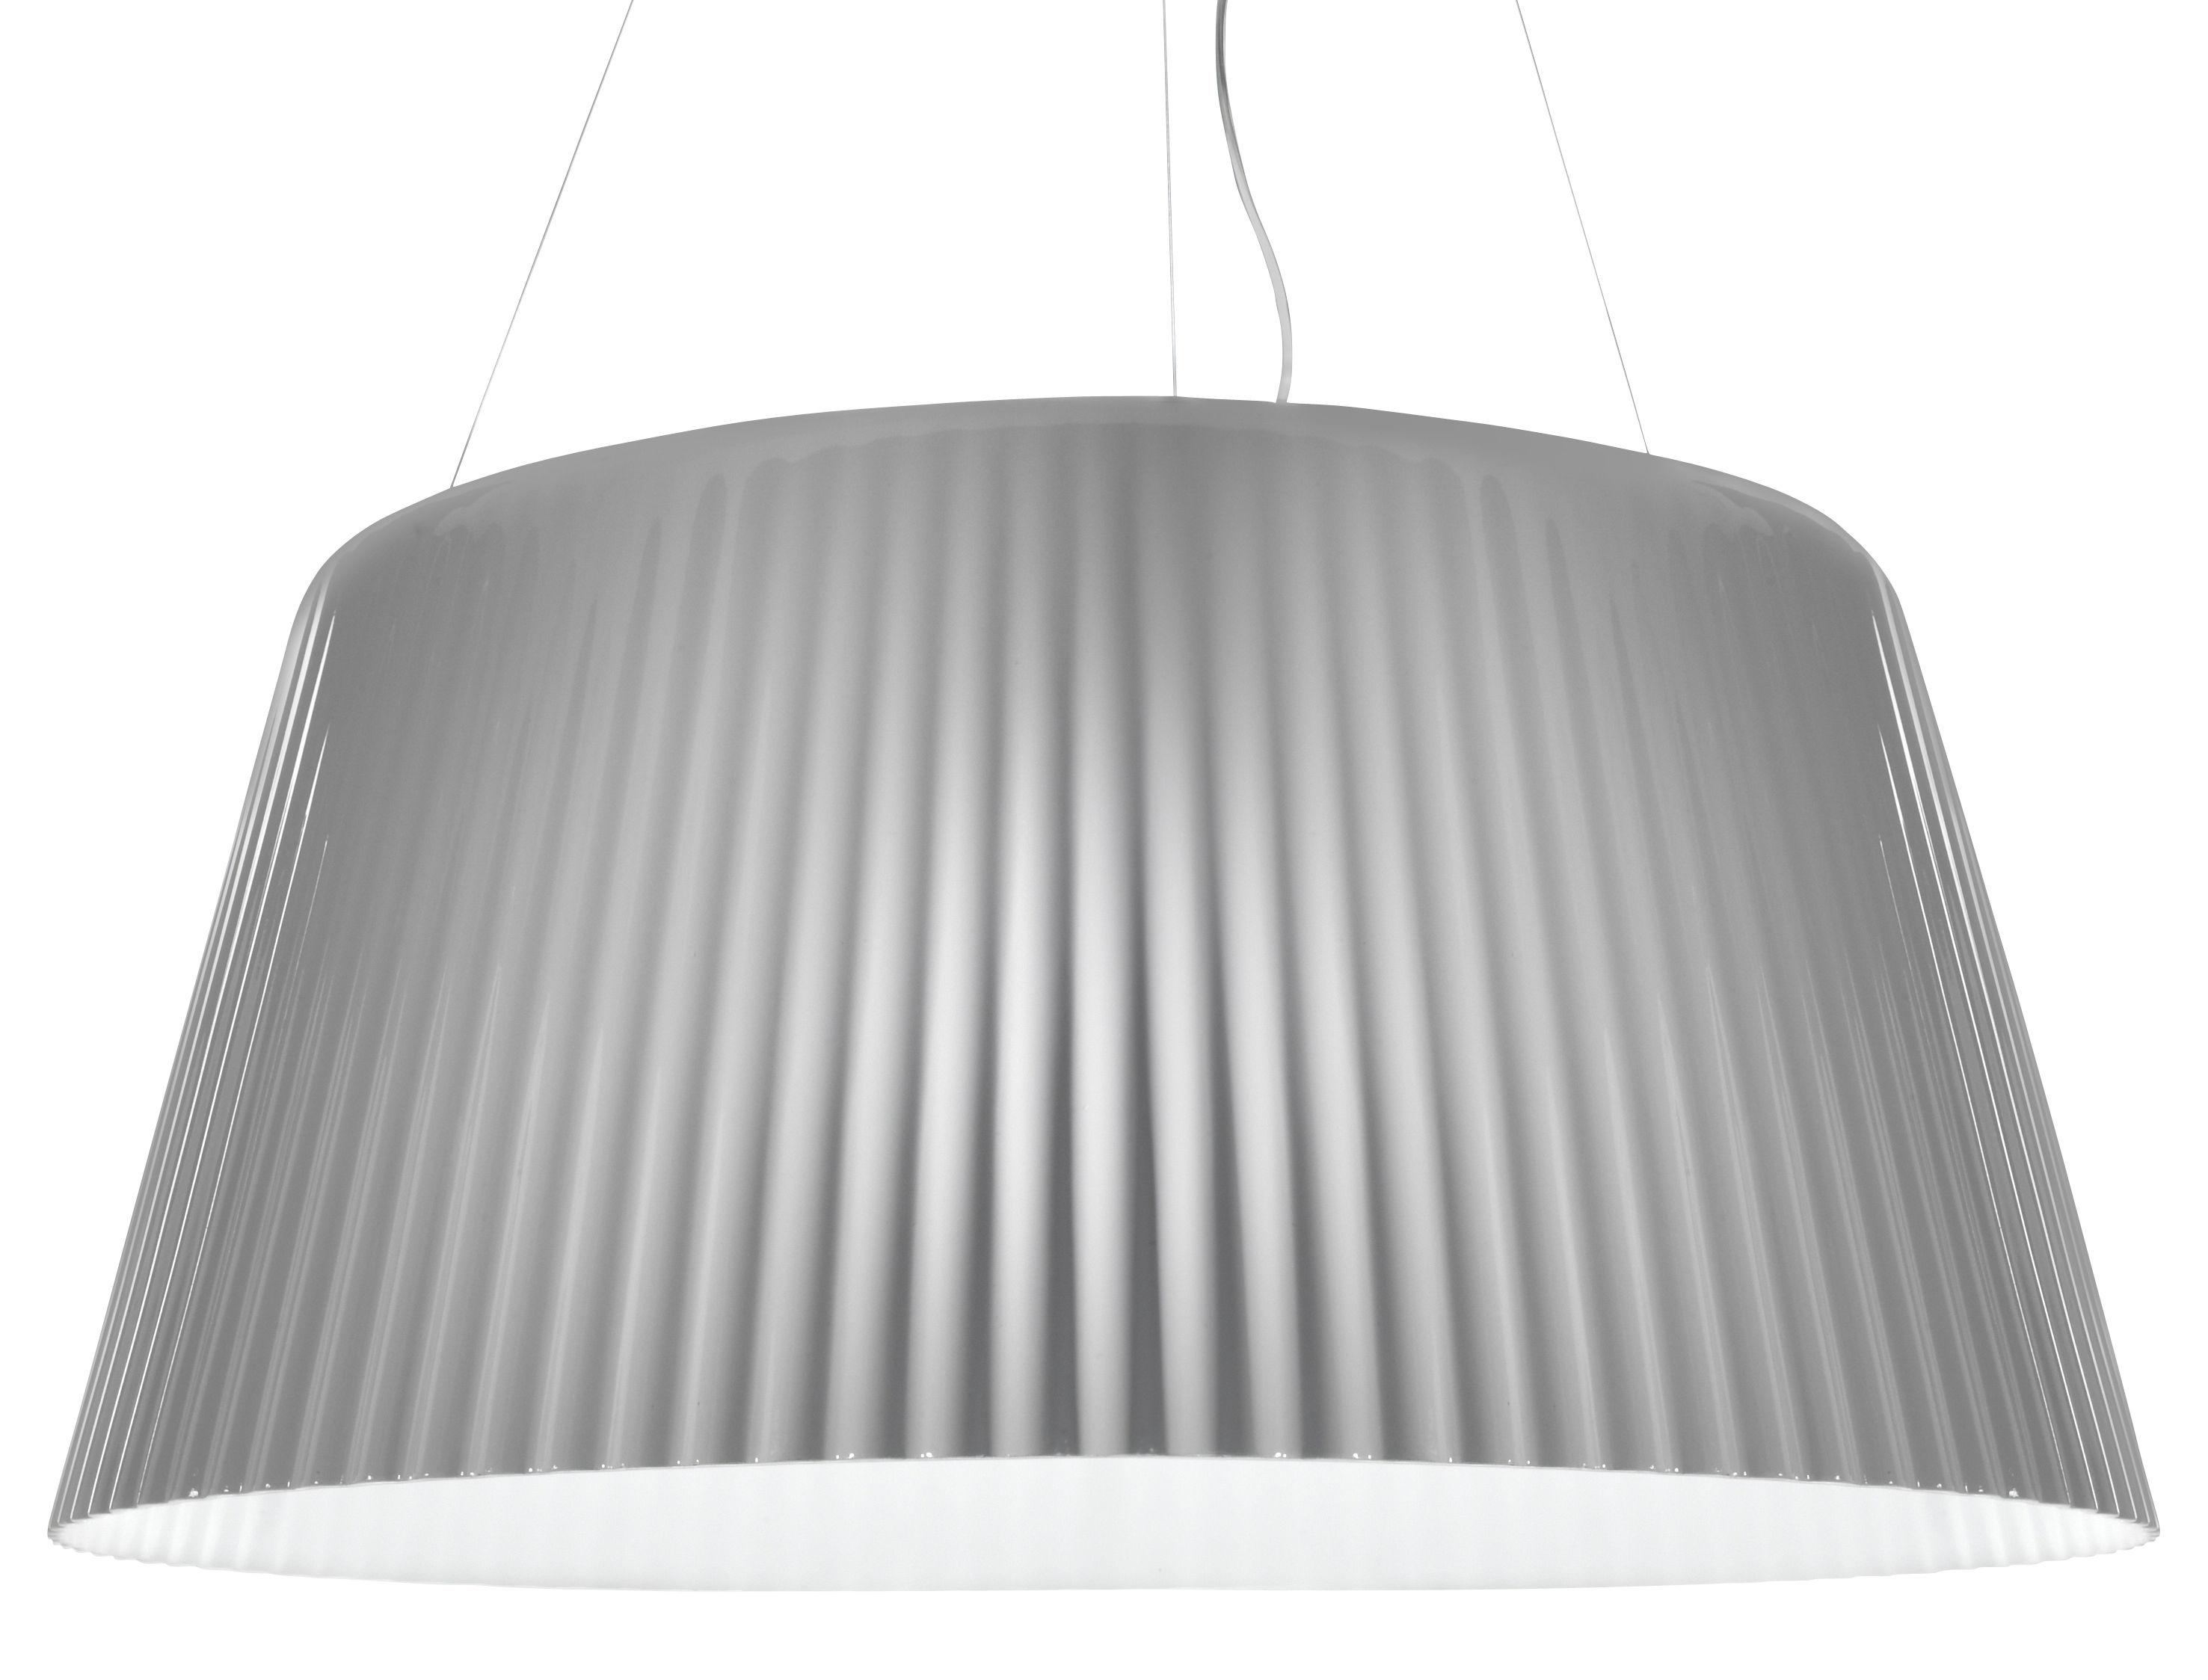 Leuchten - Pendelleuchten - Lampa-Daria Pendelleuchte - Serralunga - Weiß matt - Polyäthylen